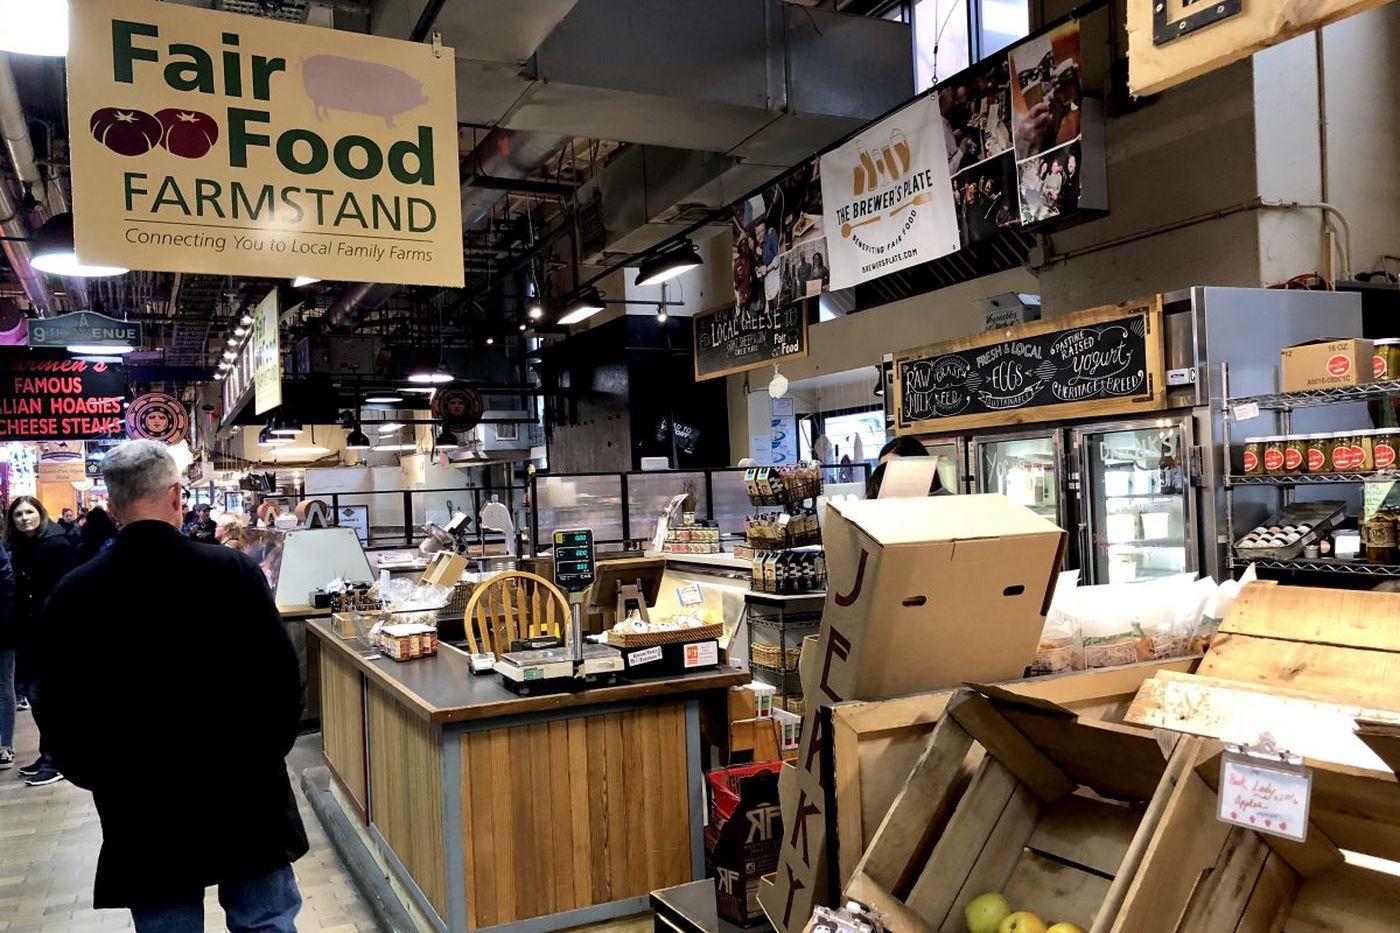 Fair Food Farmstand at Reading Terminal Market to close